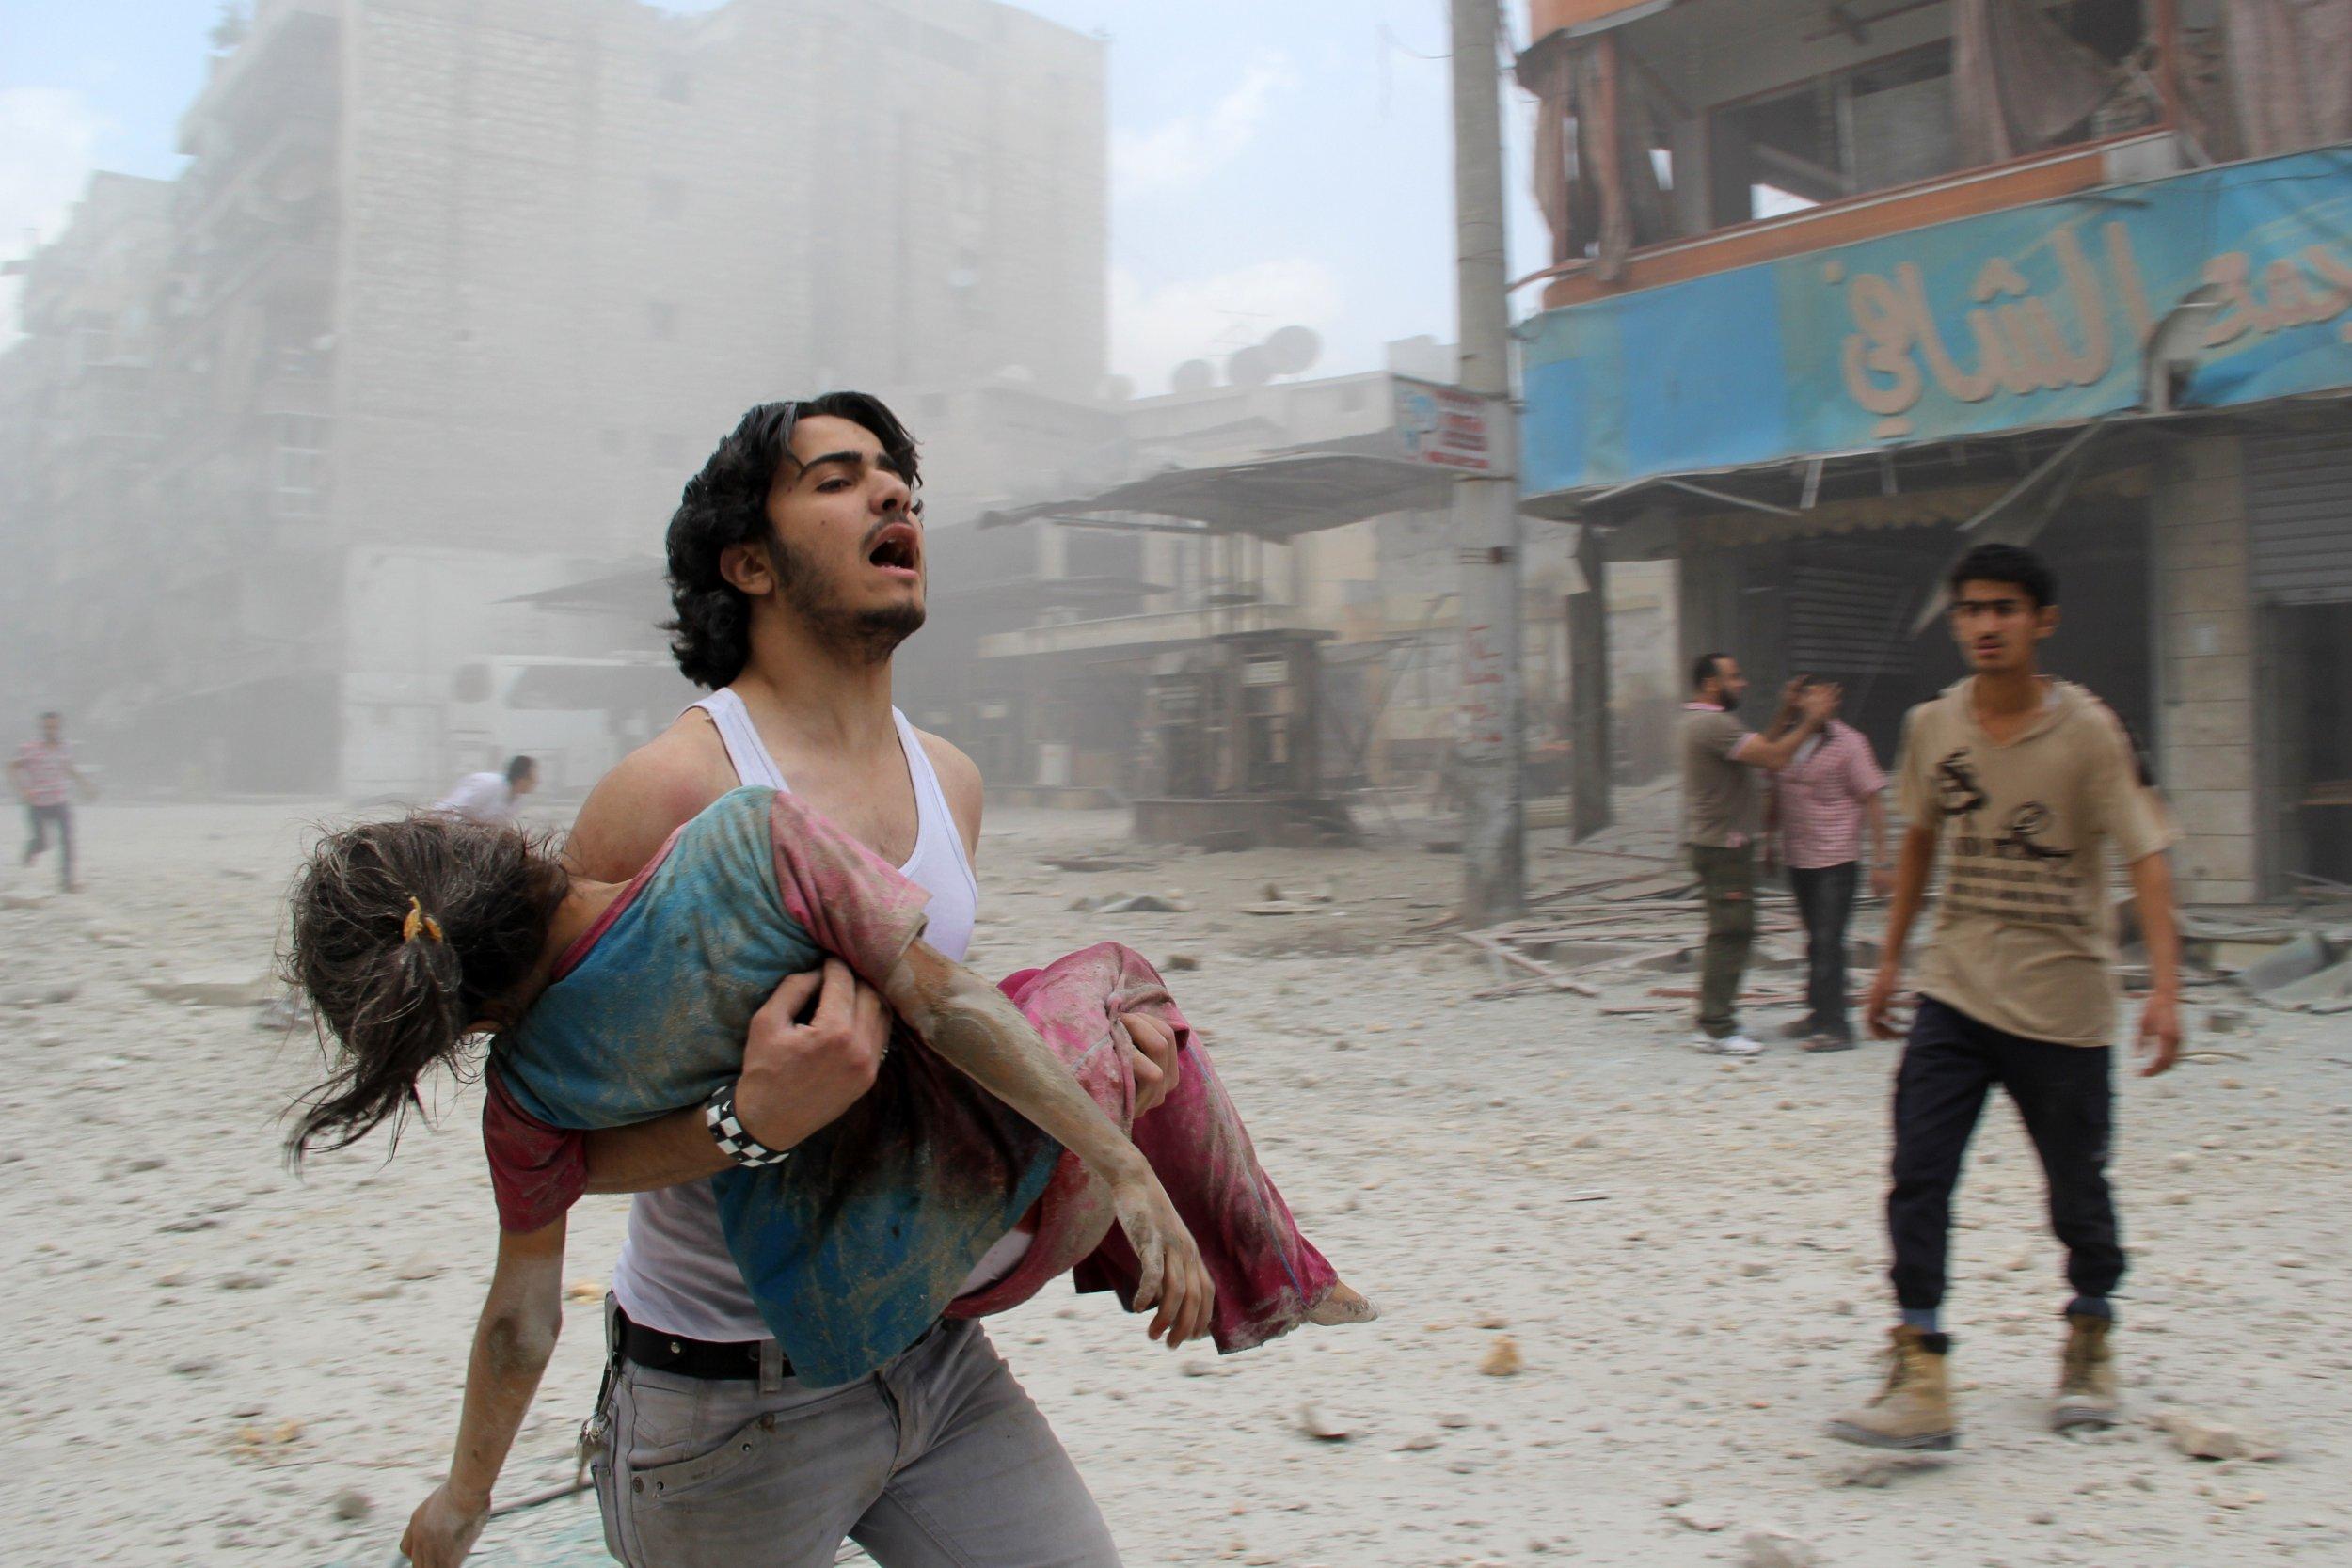 12_15_Syria